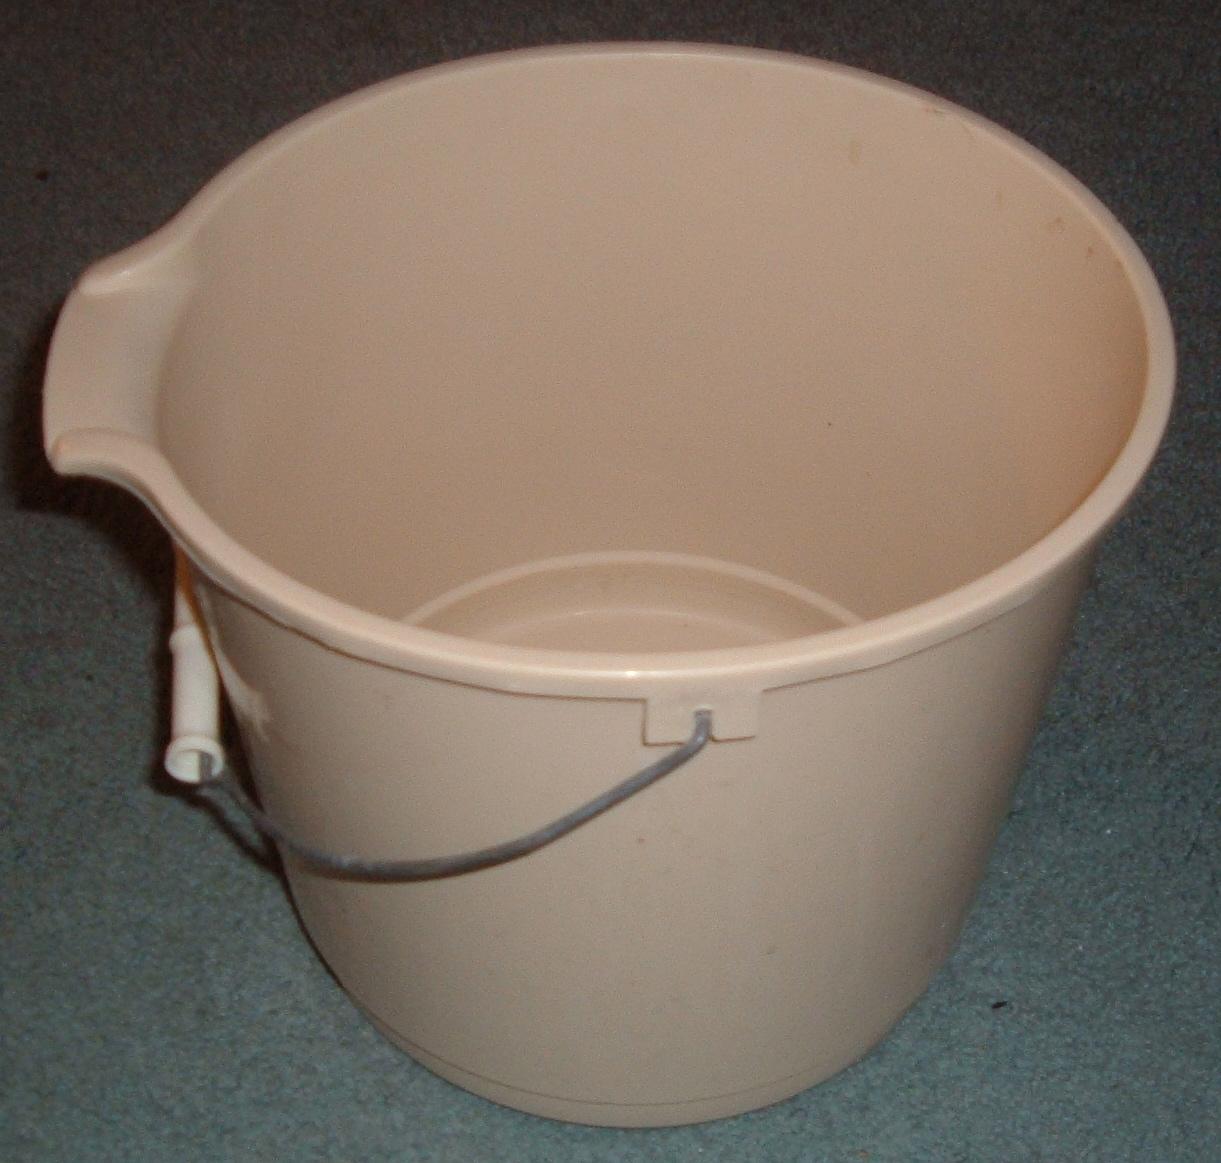 Bucket.agr.jpg